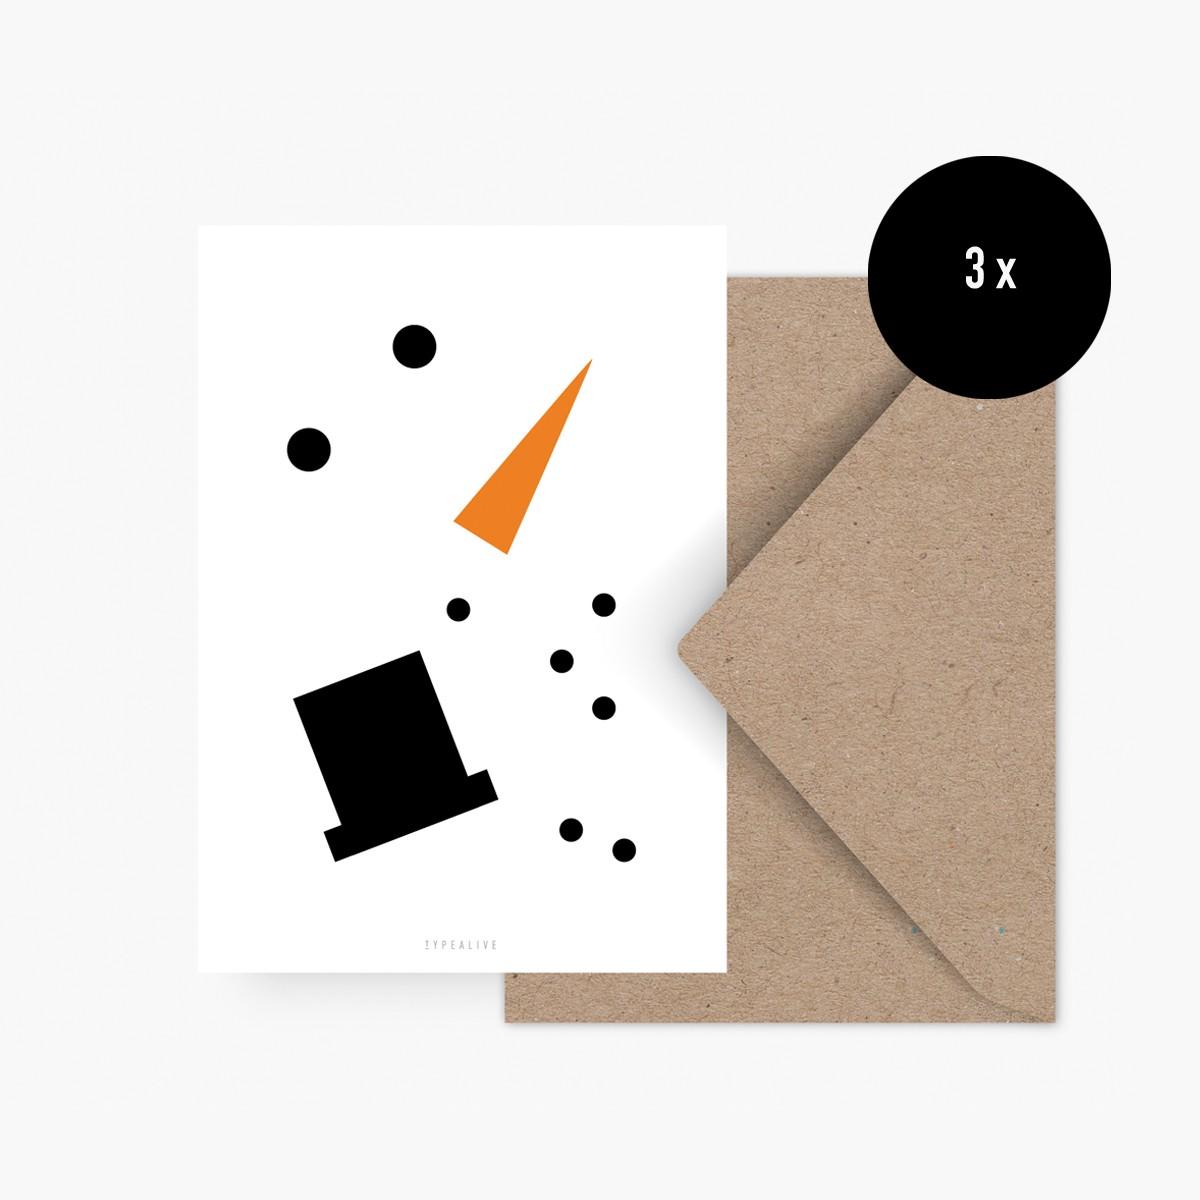 Weihnachtskarten-Set Abstract Christmas